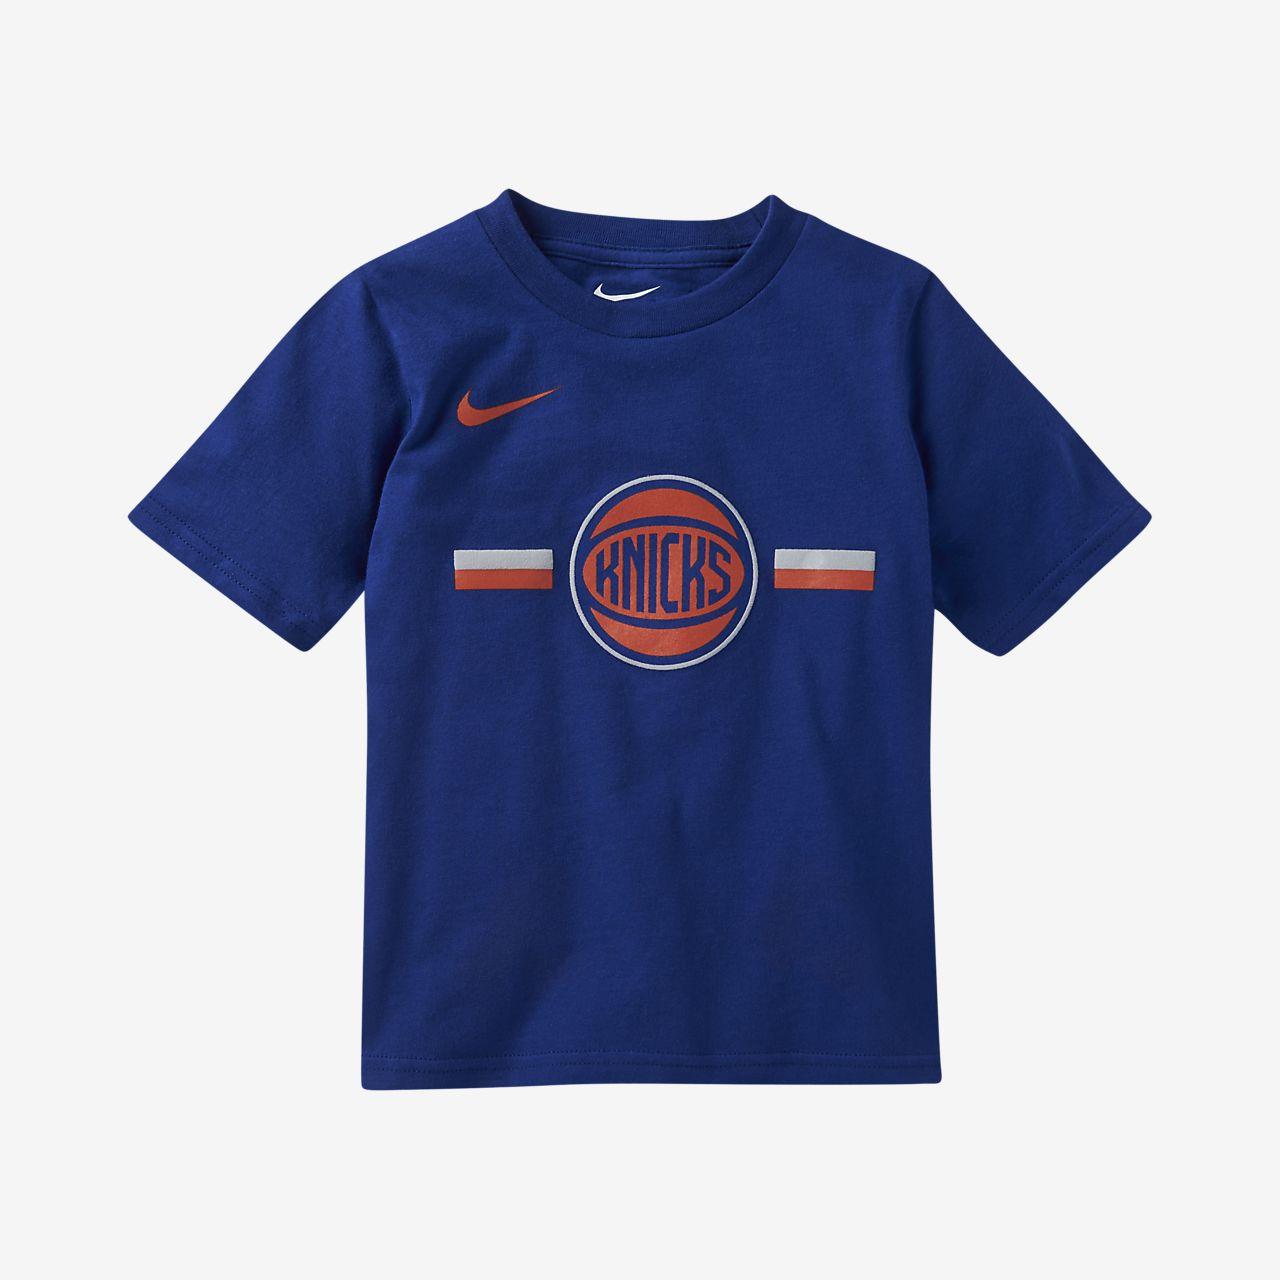 9feee50de New York Knicks Nike Logo Toddler NBA T-Shirt. Nike.com